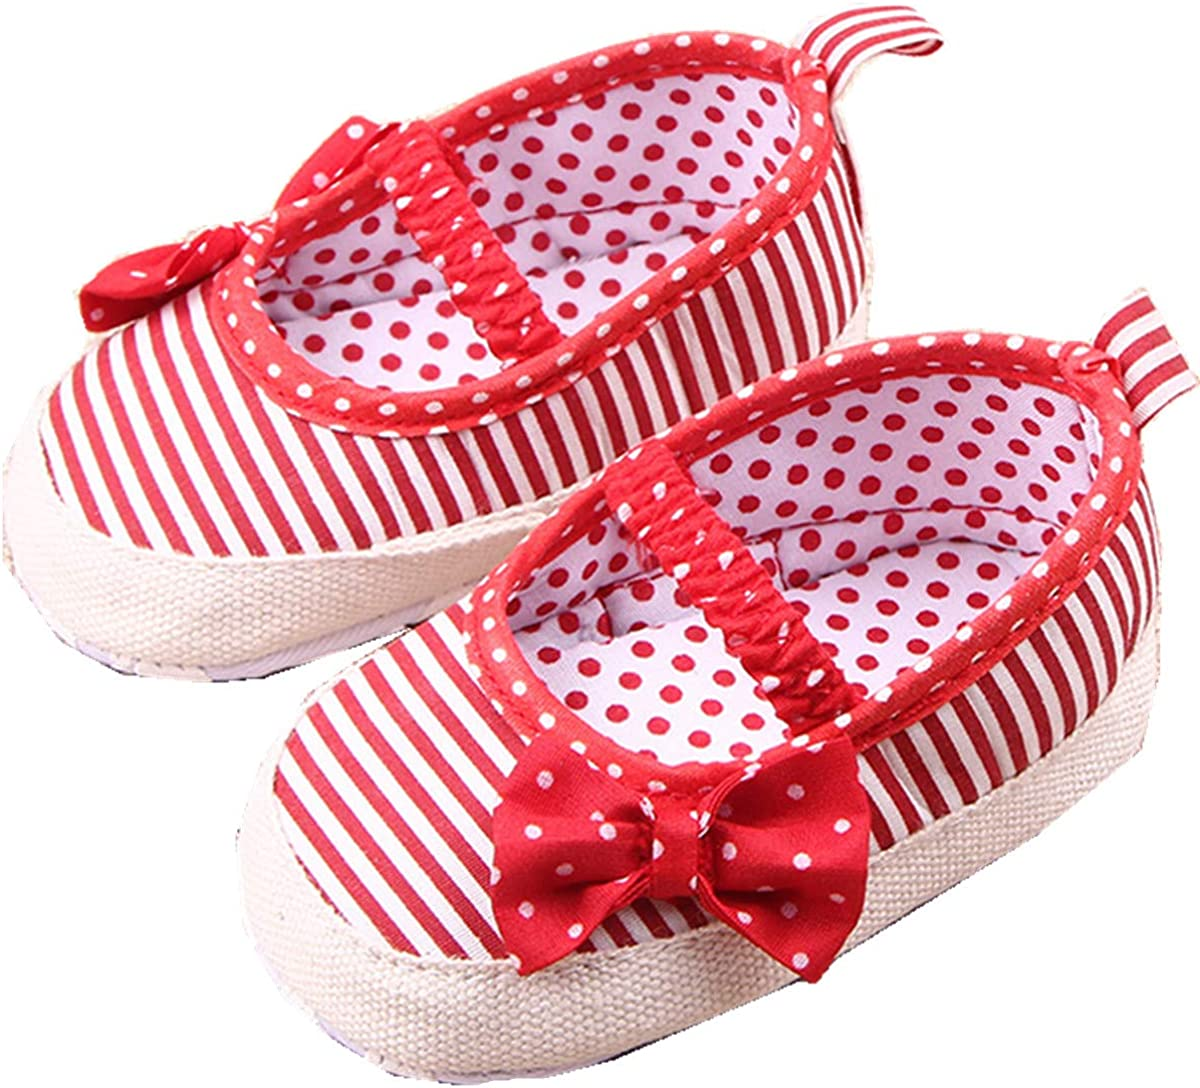 ADIASEN,Baby Unisex Shoes,Newborn Shoes,Infant Shoes,Toddler Shoes,Cute Baby Canvas Sneaker Antiskid Soft Trainer Shoes Soft Sole Shoes Anti-Slip